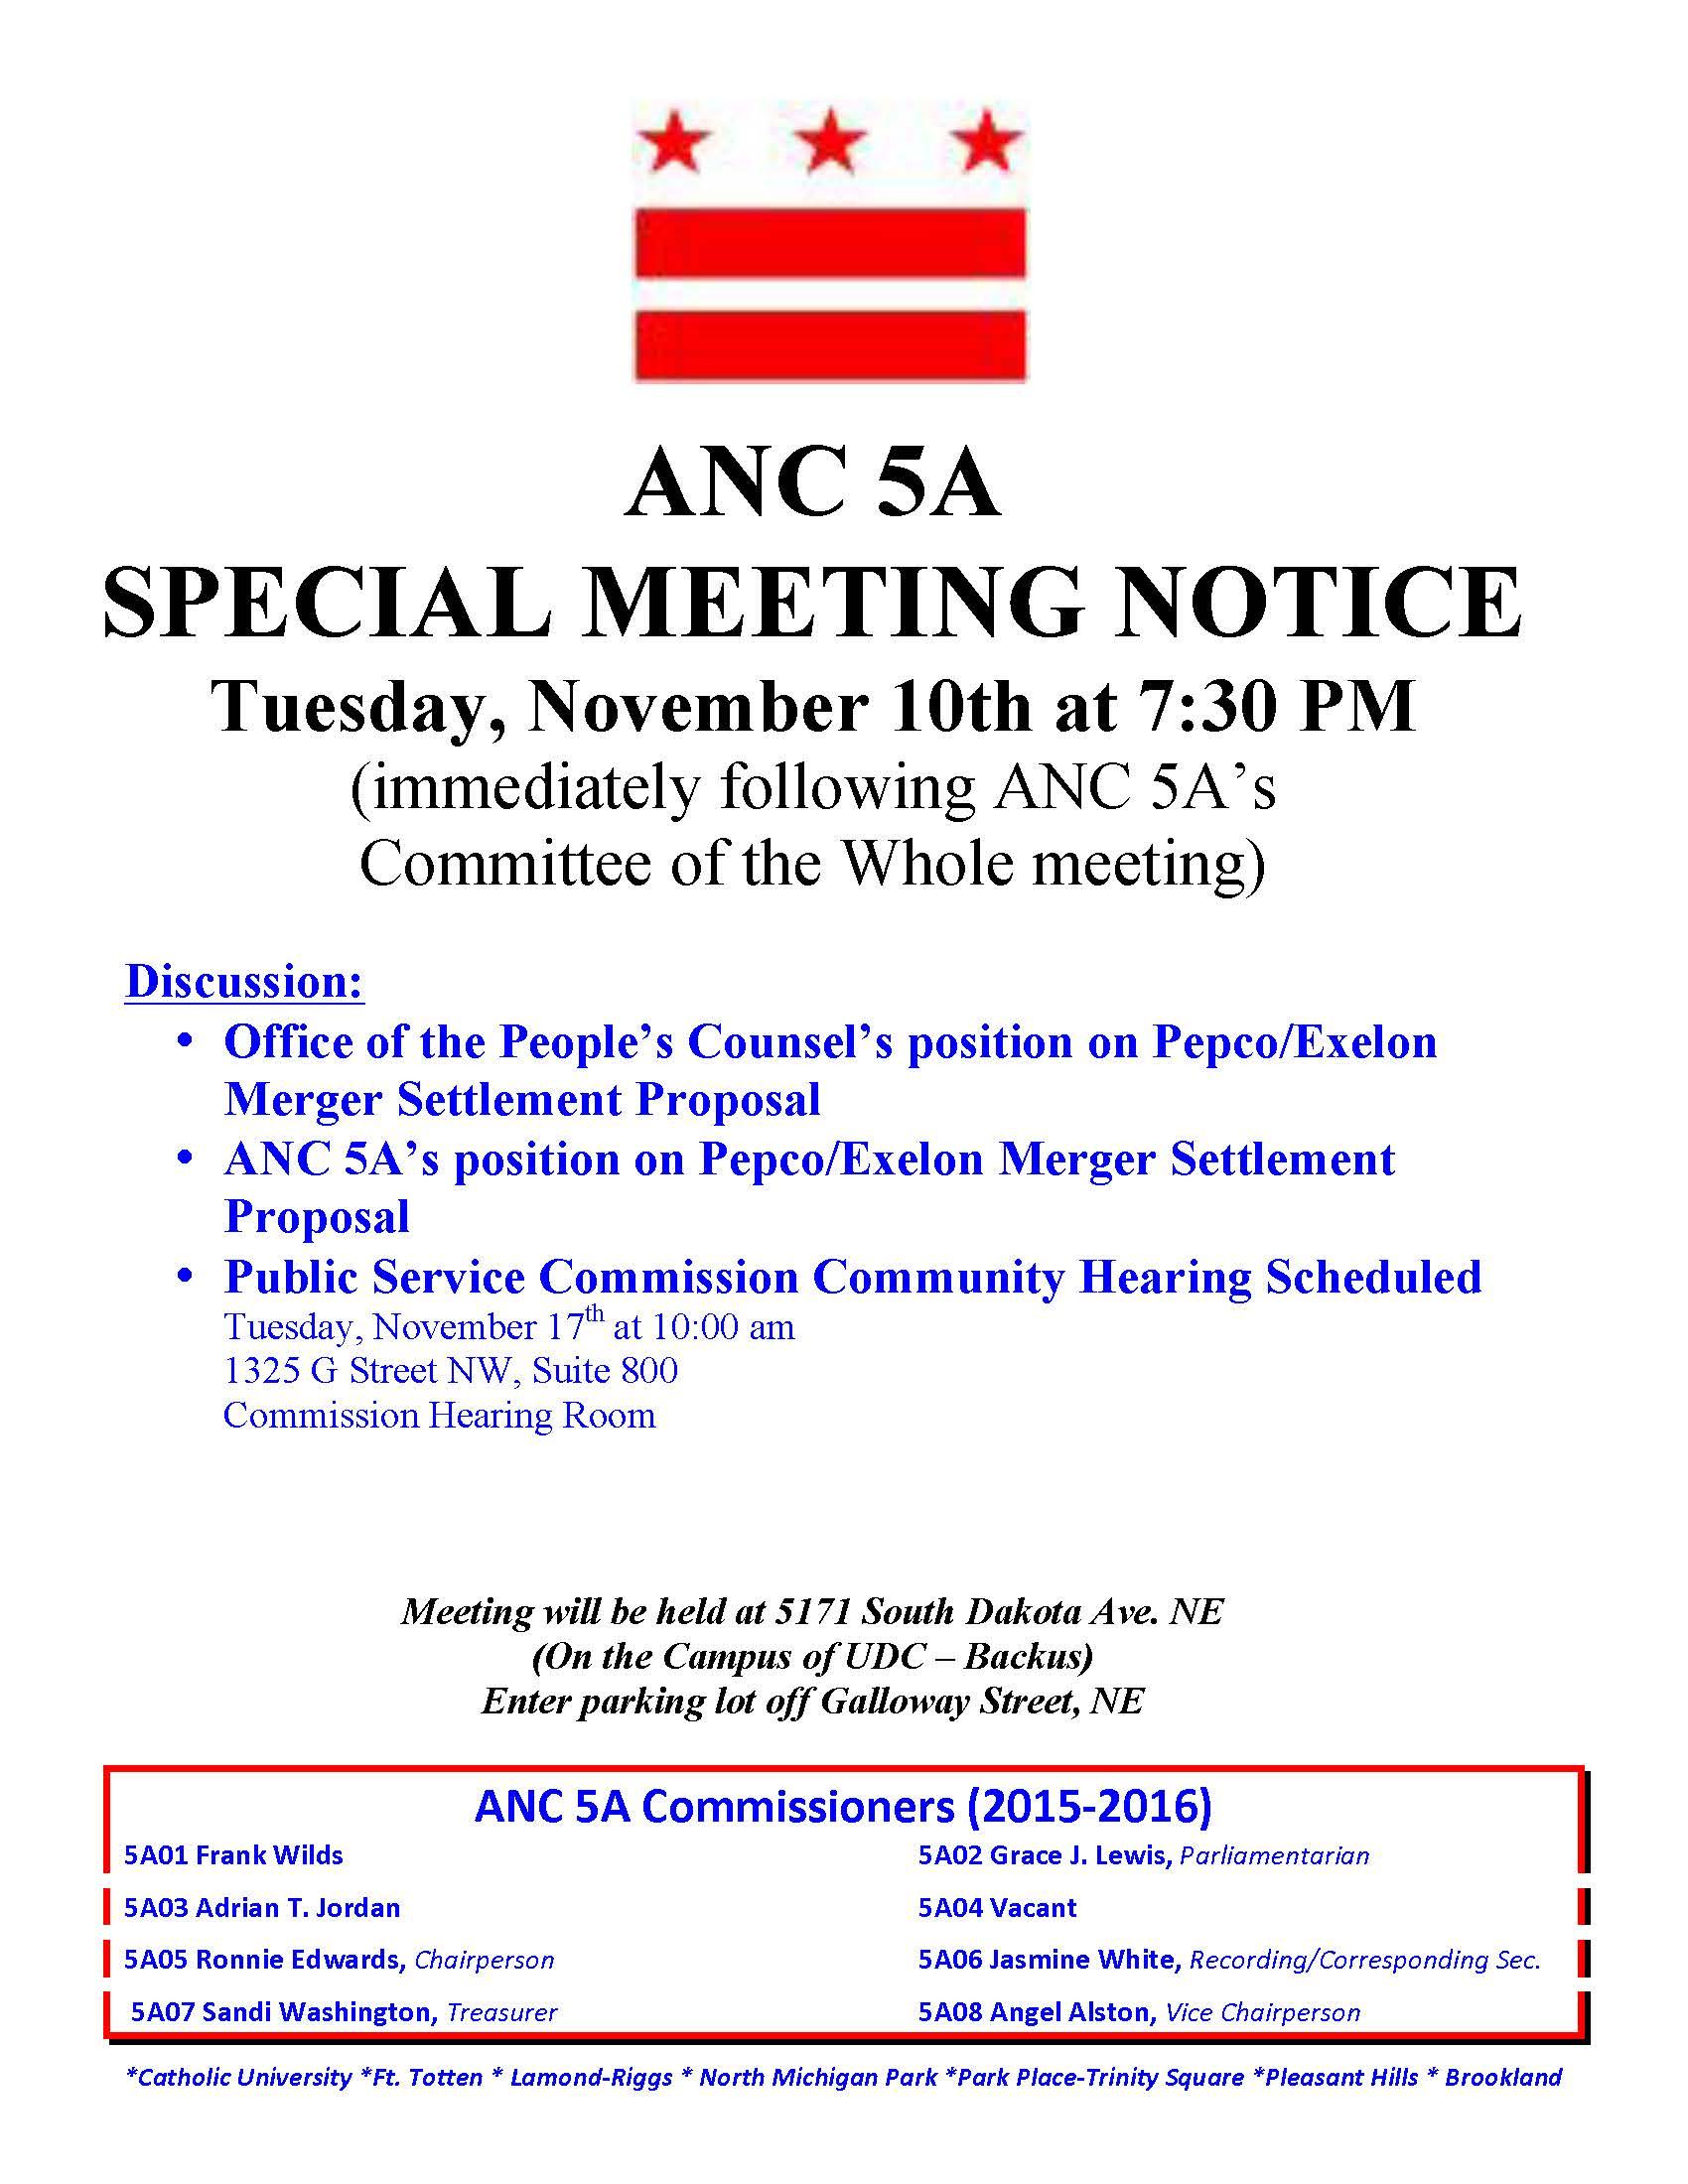 ANC 5A Nov 2015 Special Meeting Notice